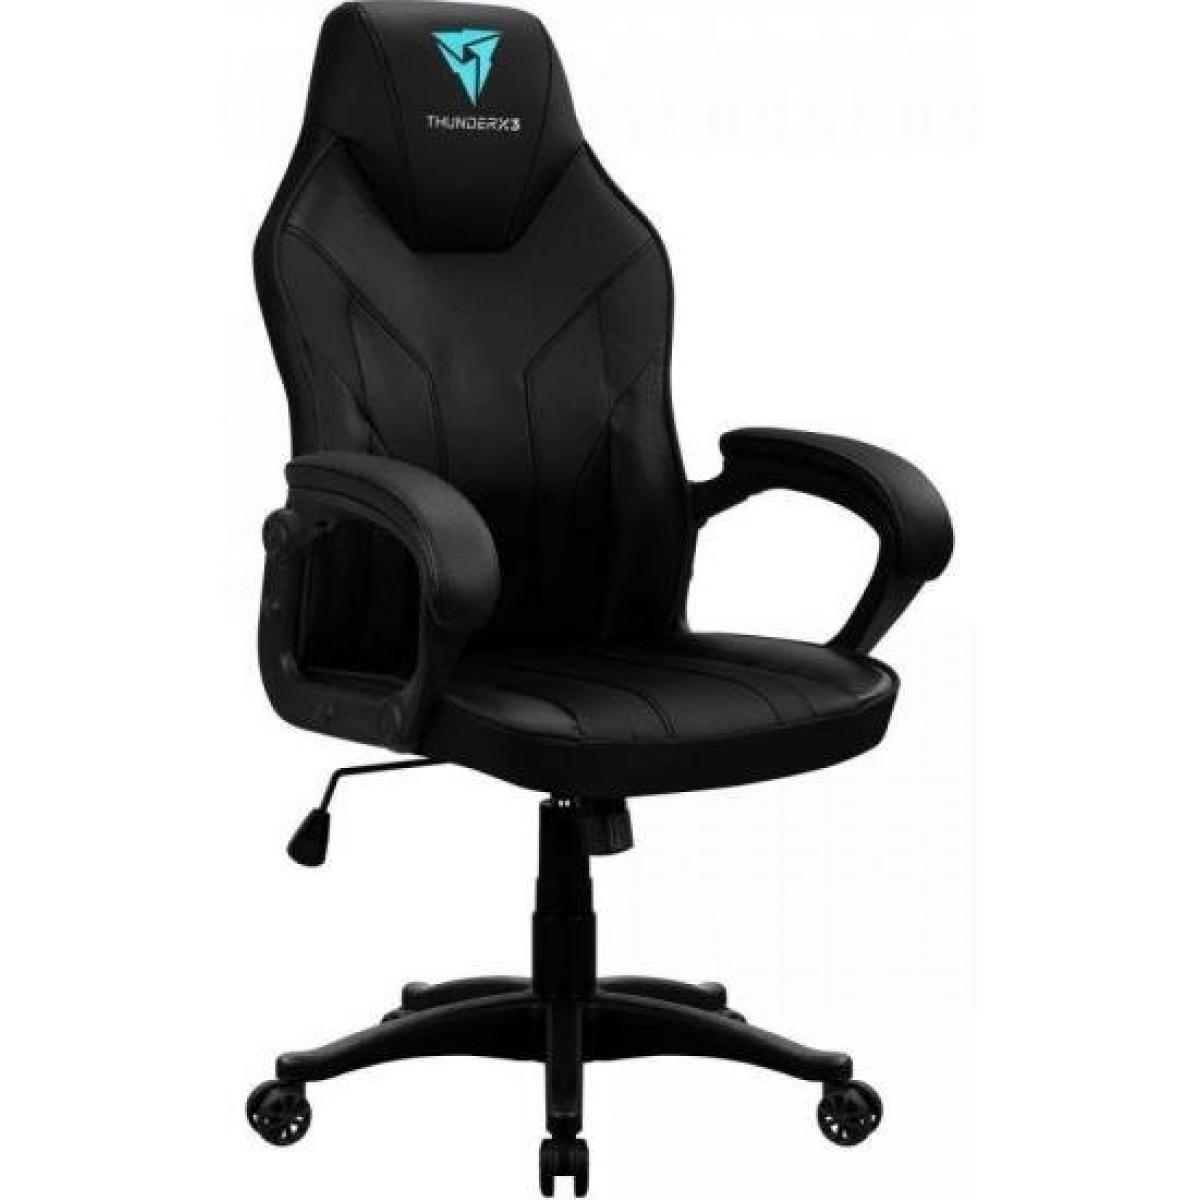 Cadeira Gamer ThunderX3 EC1, AIR Tech, Black